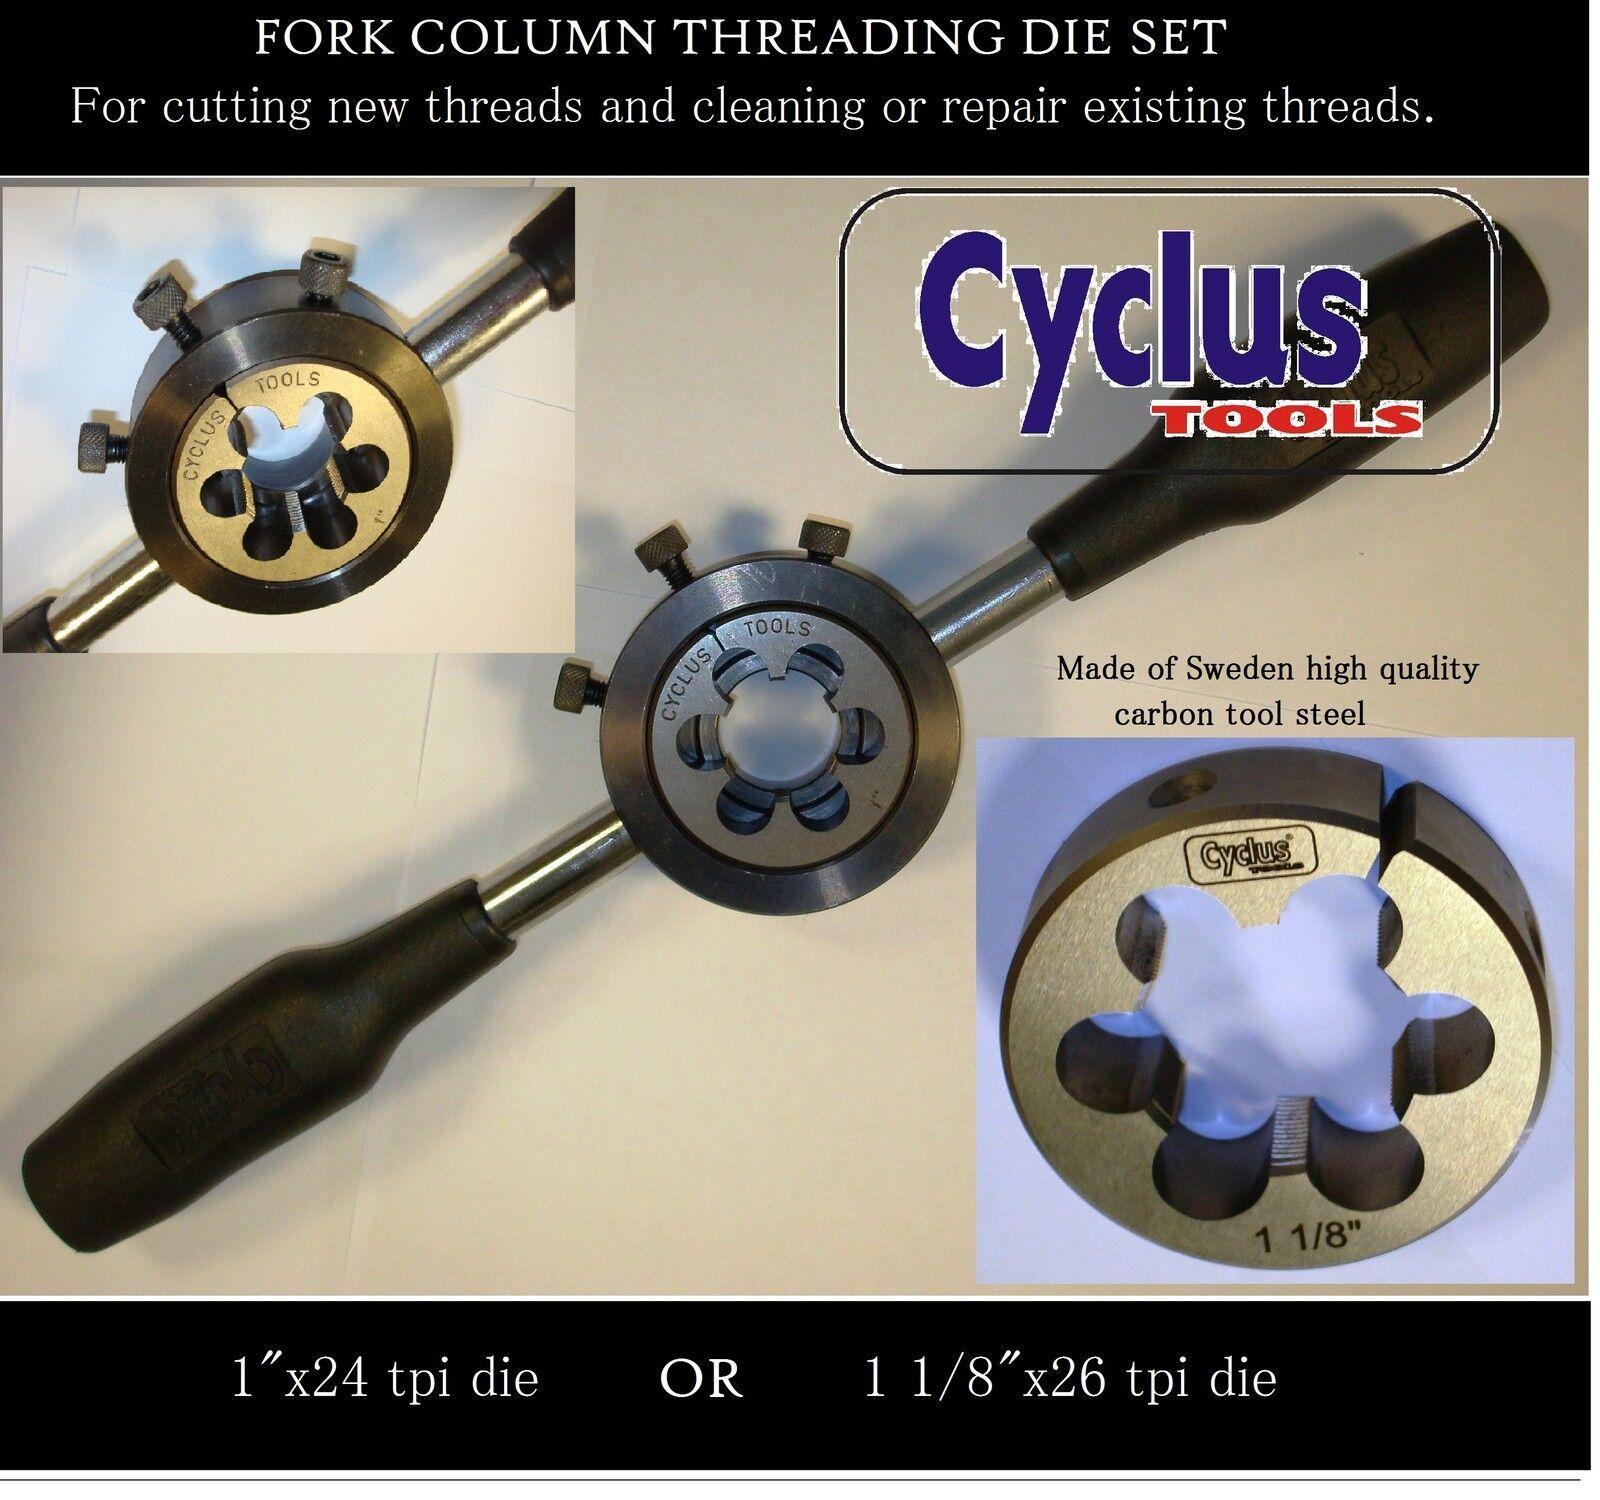 Bicycle steer tube threading tool 1  x 24  for vintage bike forks